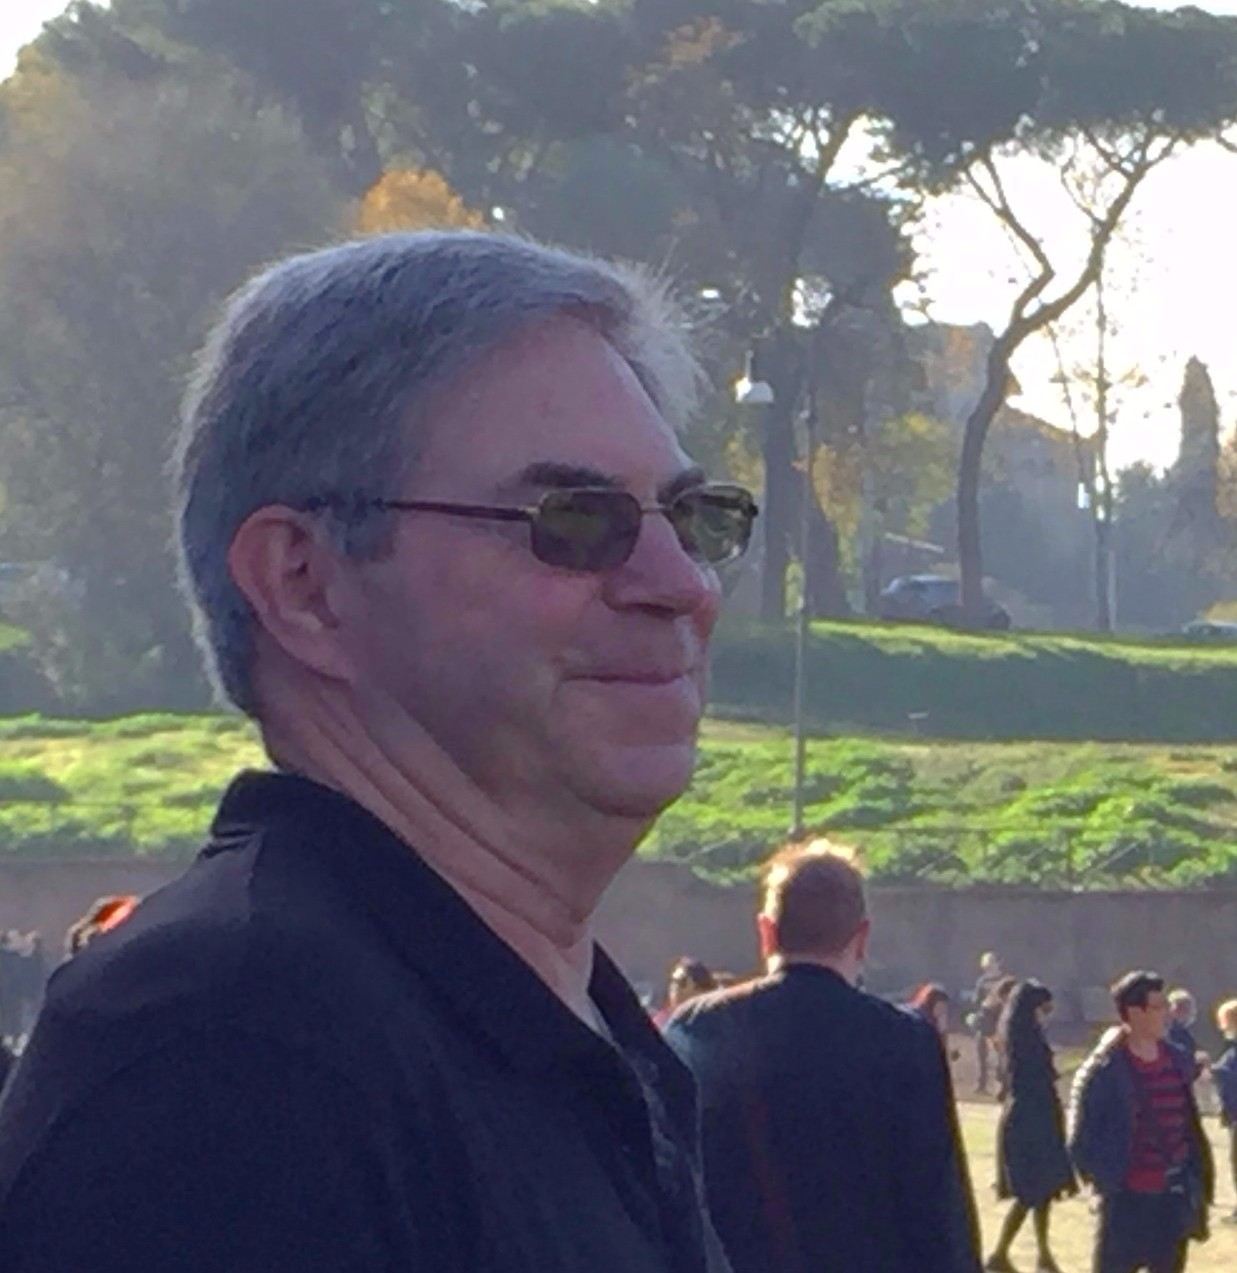 Mike Havener